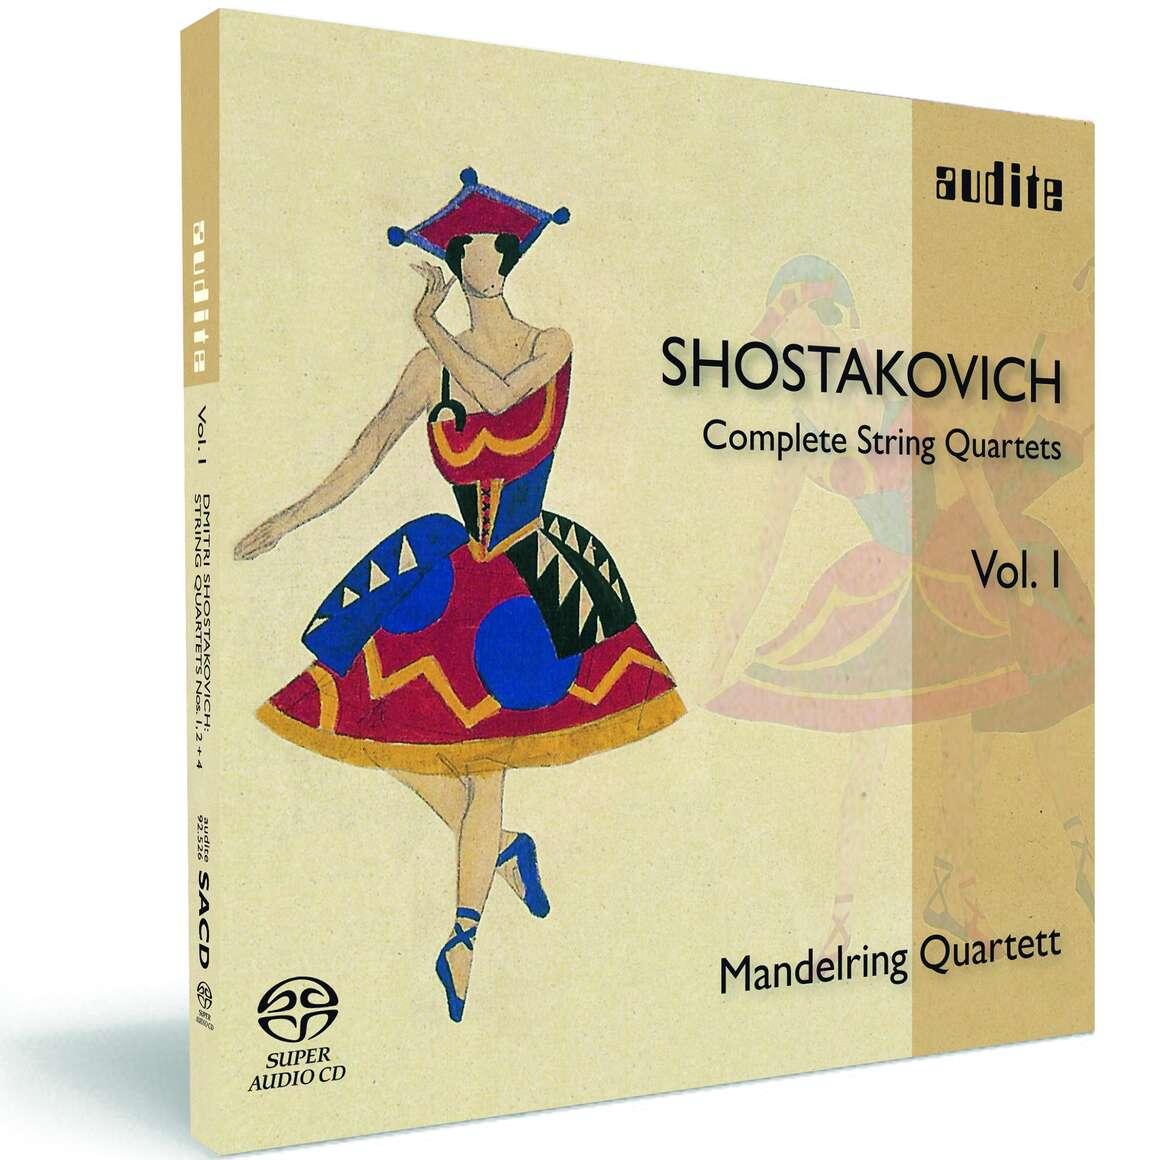 D. Shostakovich: Complete String Quartets Vol. I